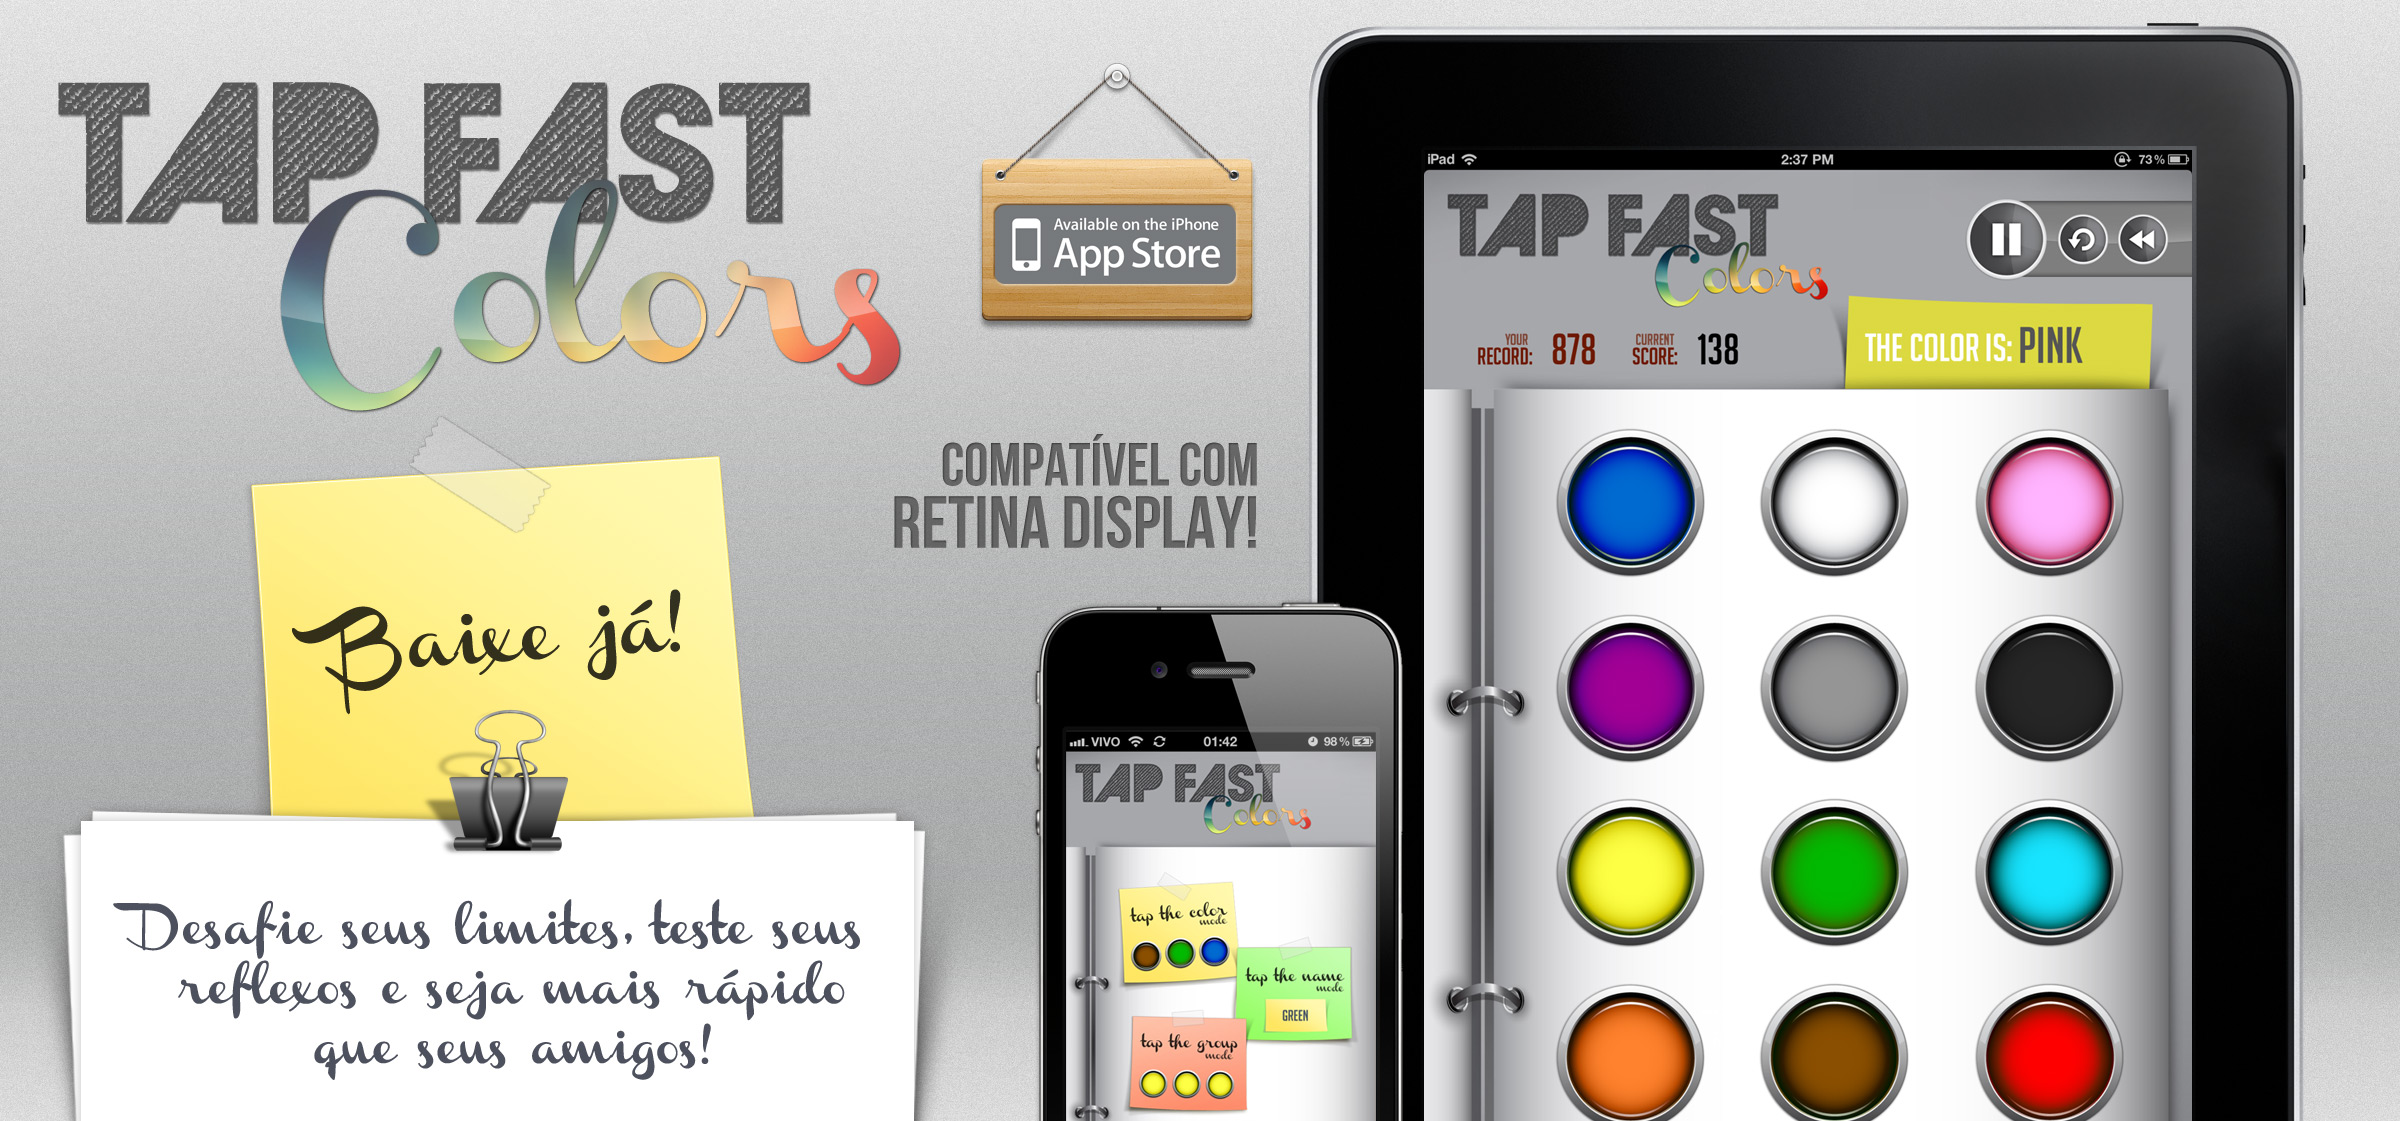 Tap Fast para iOS